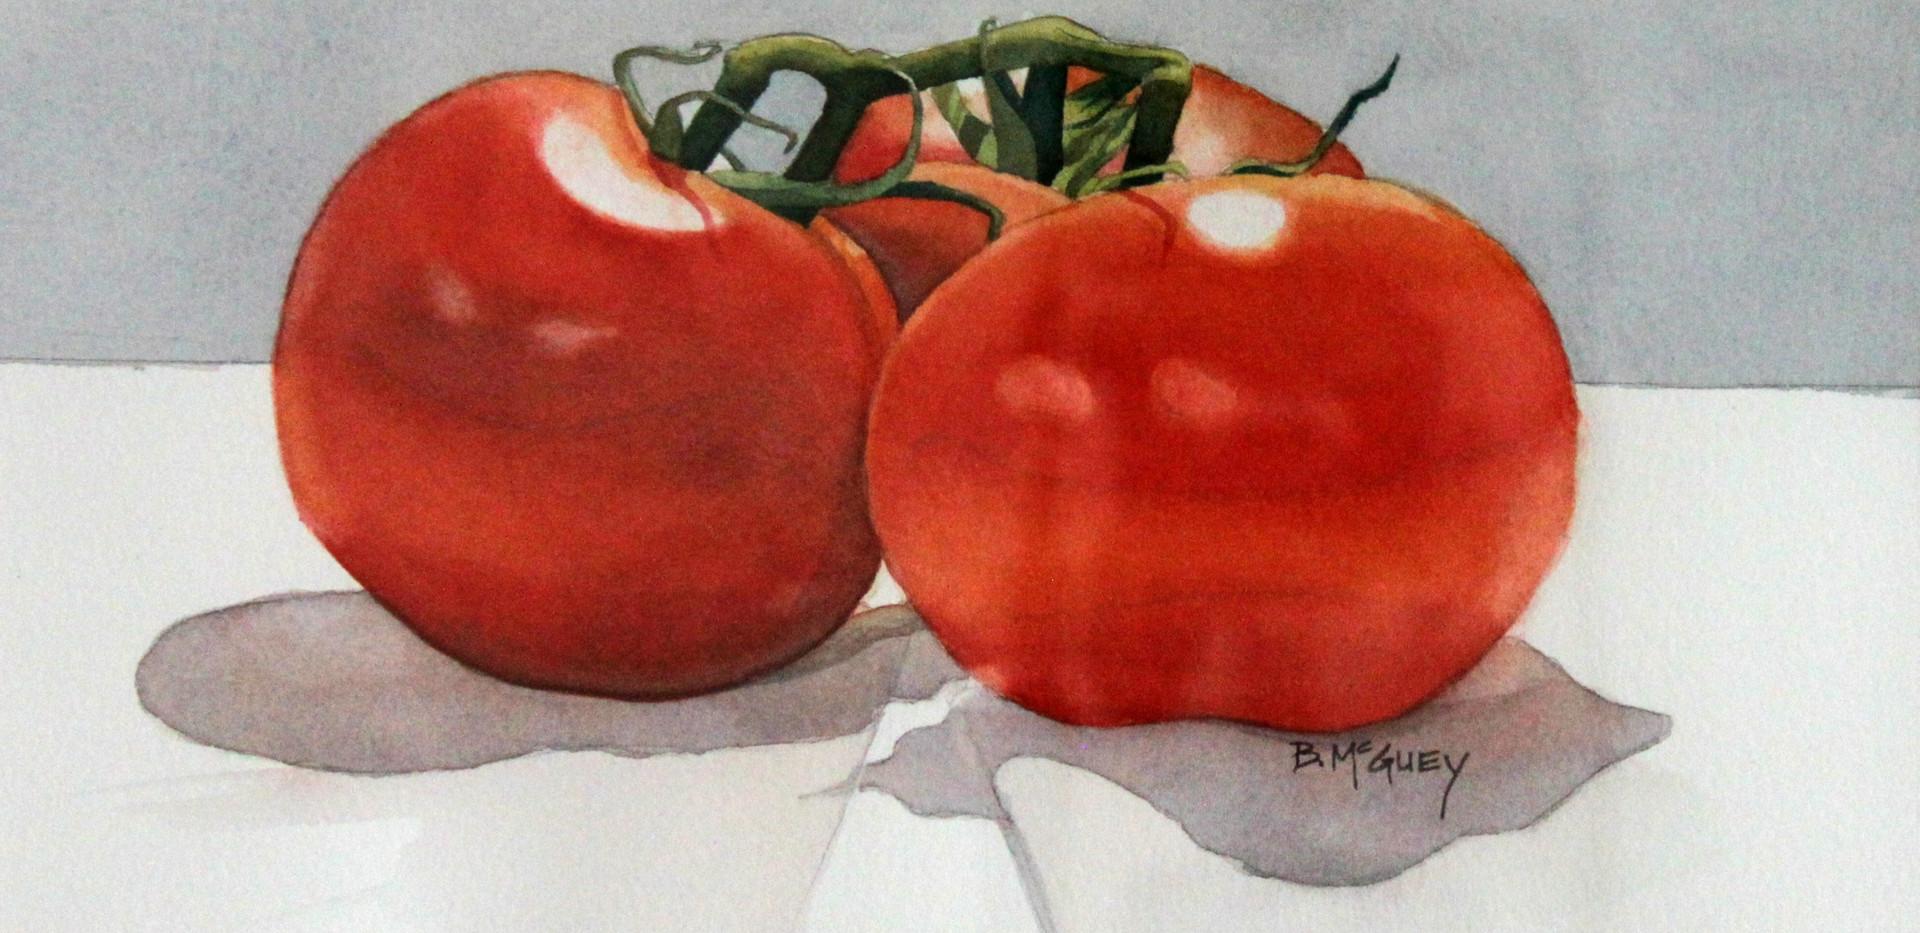 BMcGuey17-06 - Vine Tomatoes.JPG